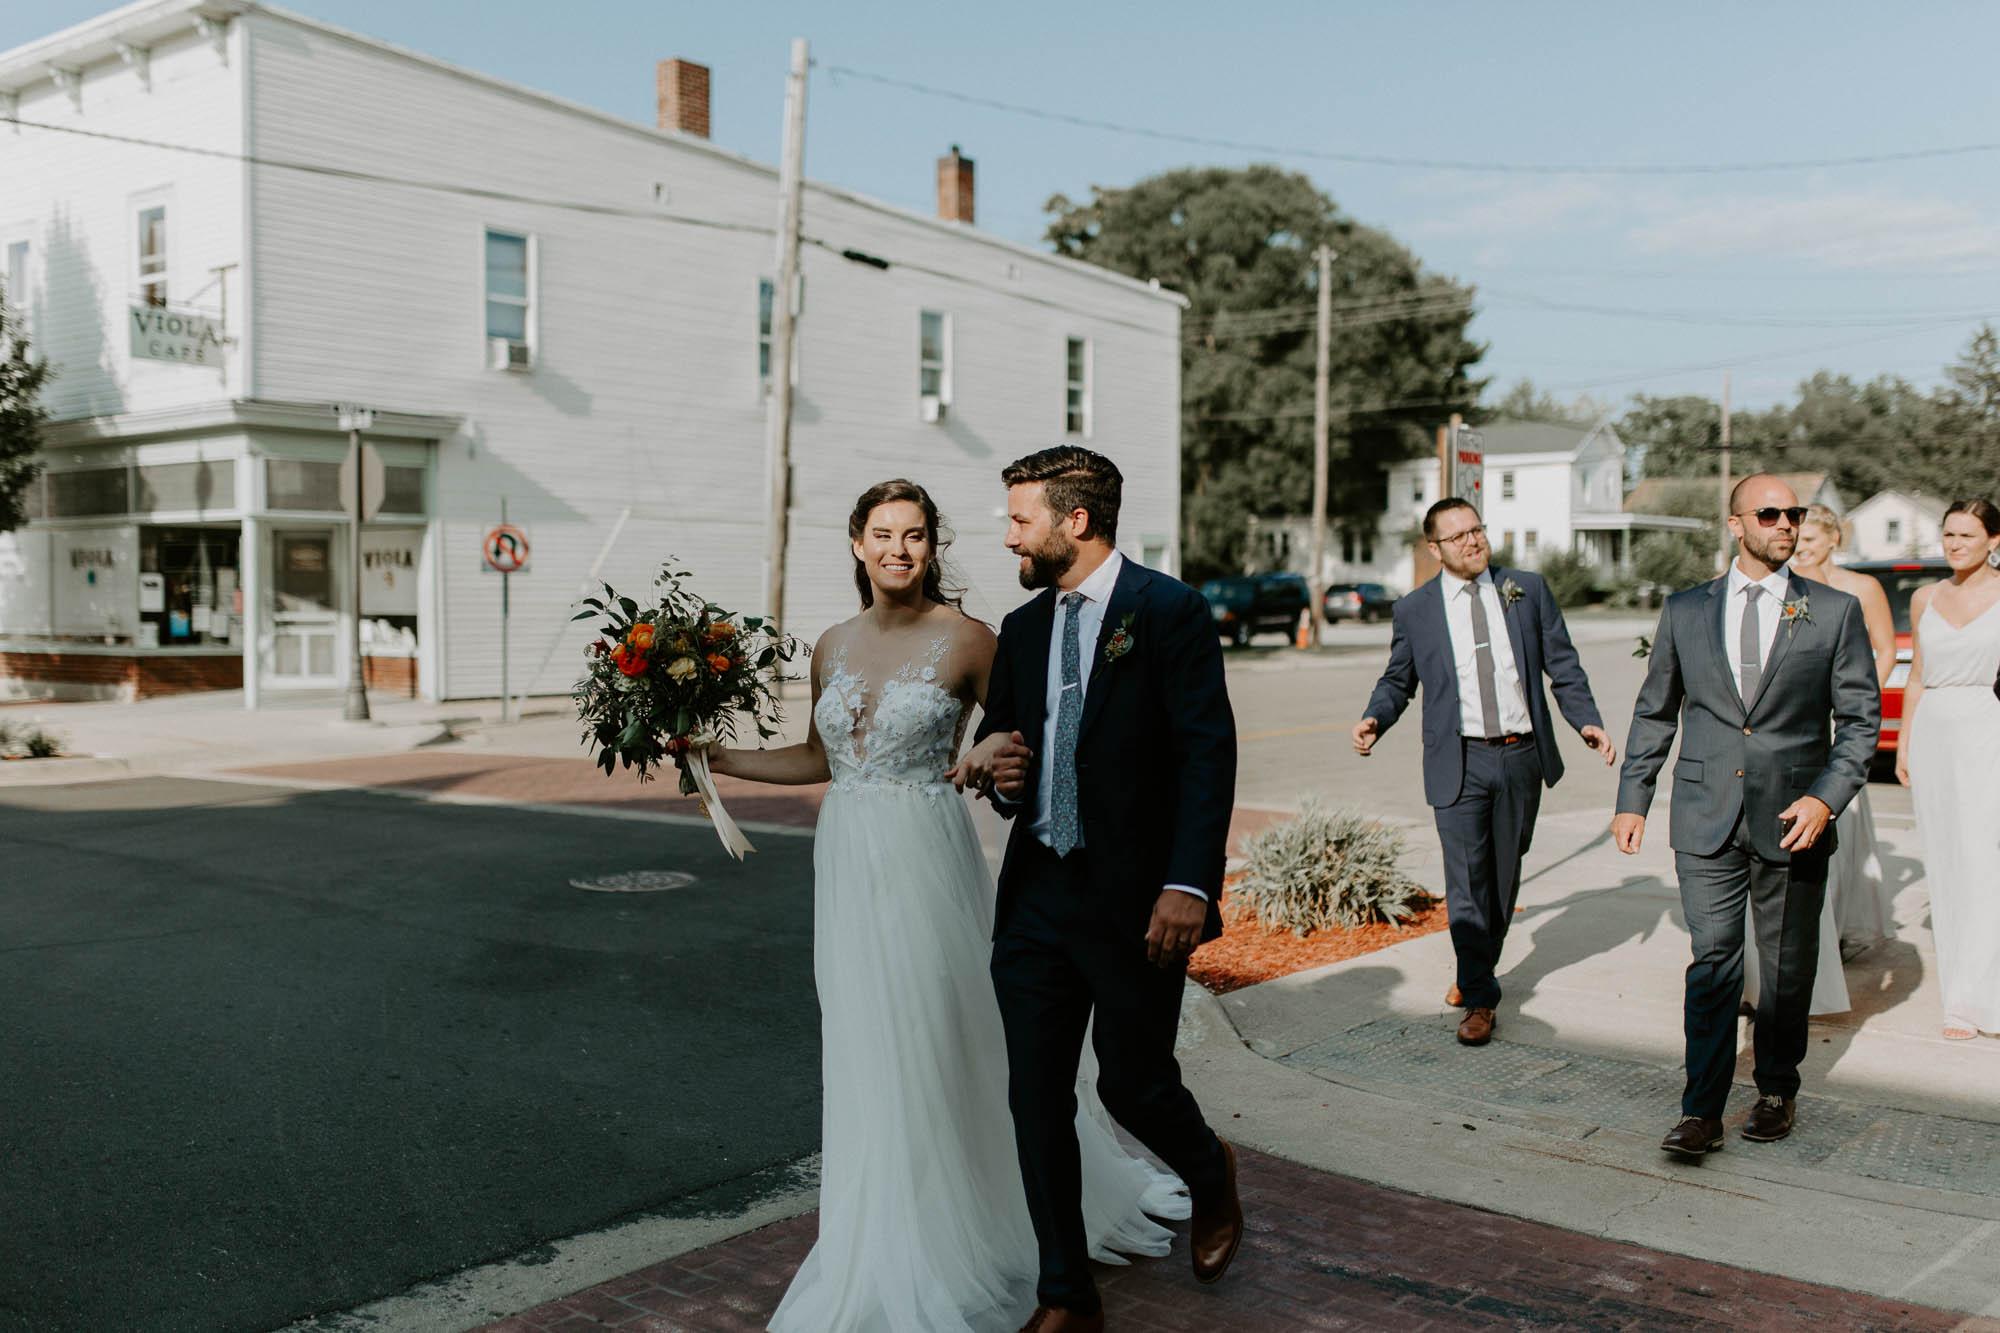 journeyman_distillery_wedding_photographer_chicago_il_wright_photographs-3950.jpg